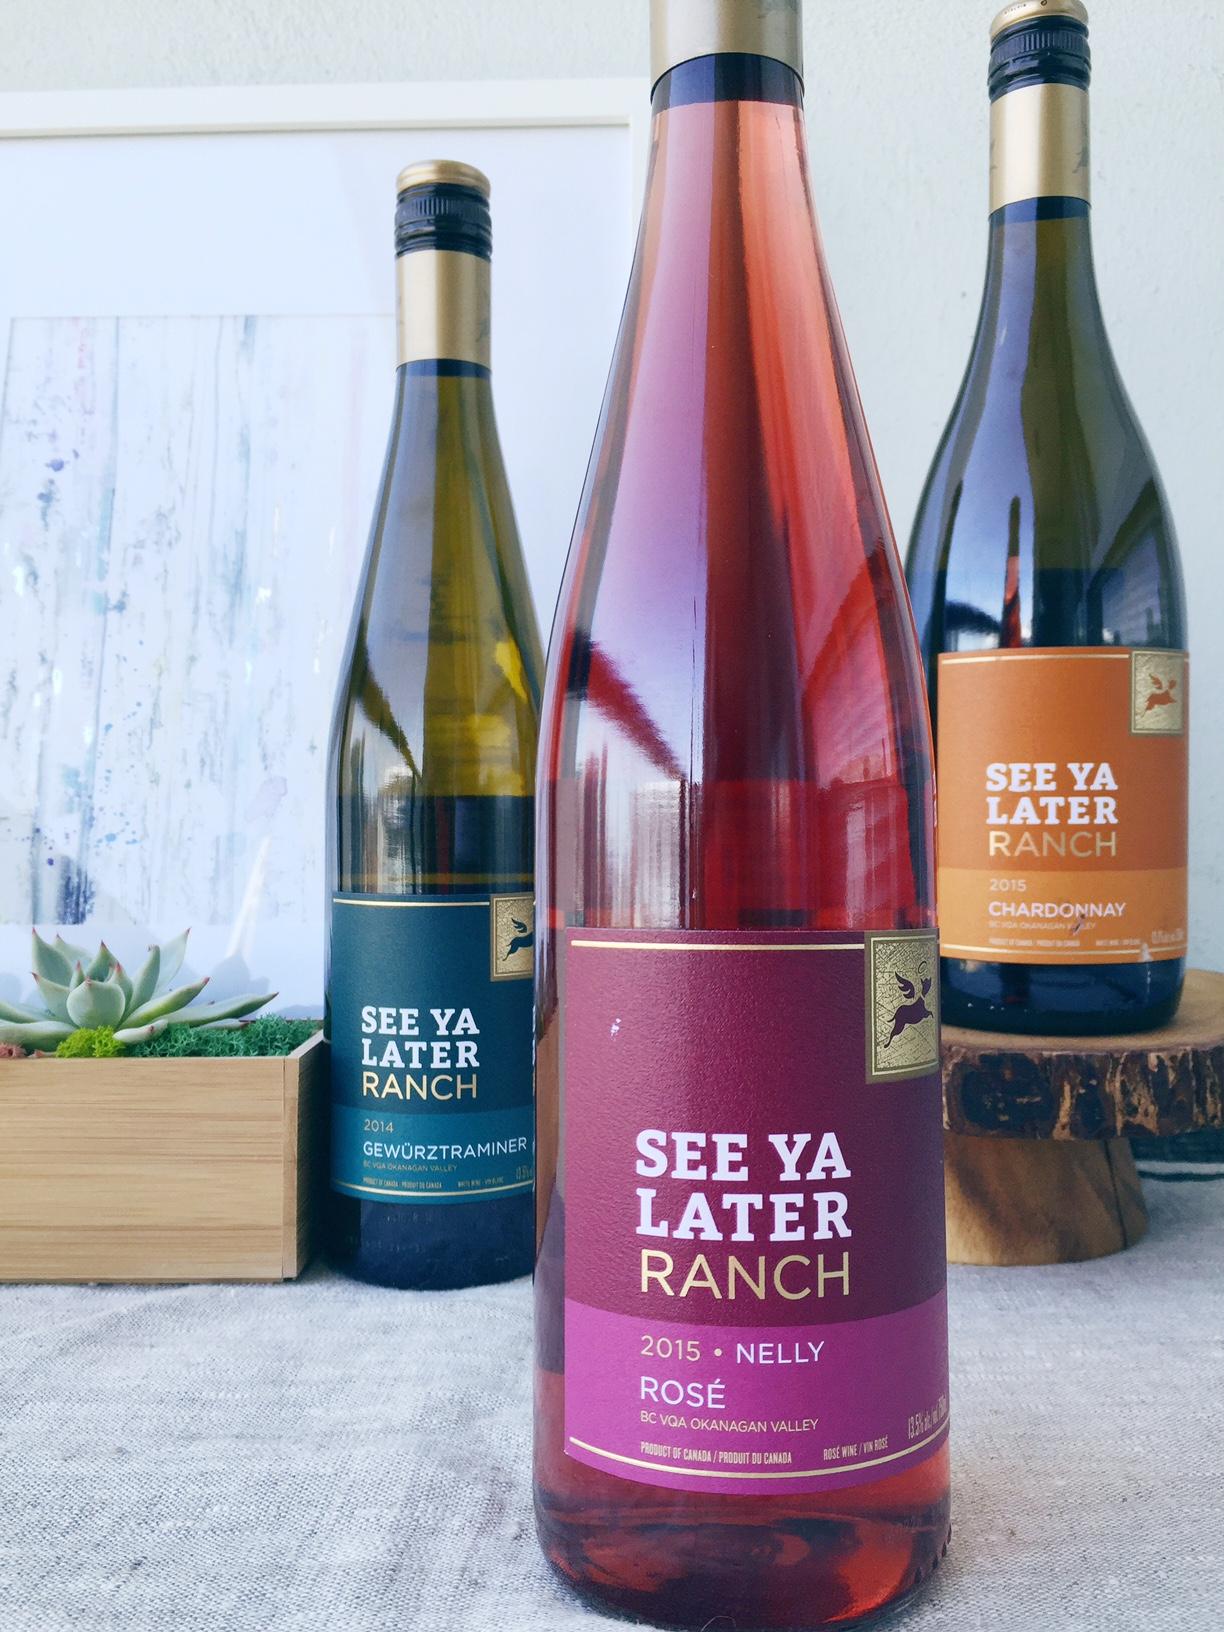 see ya later ranch wines